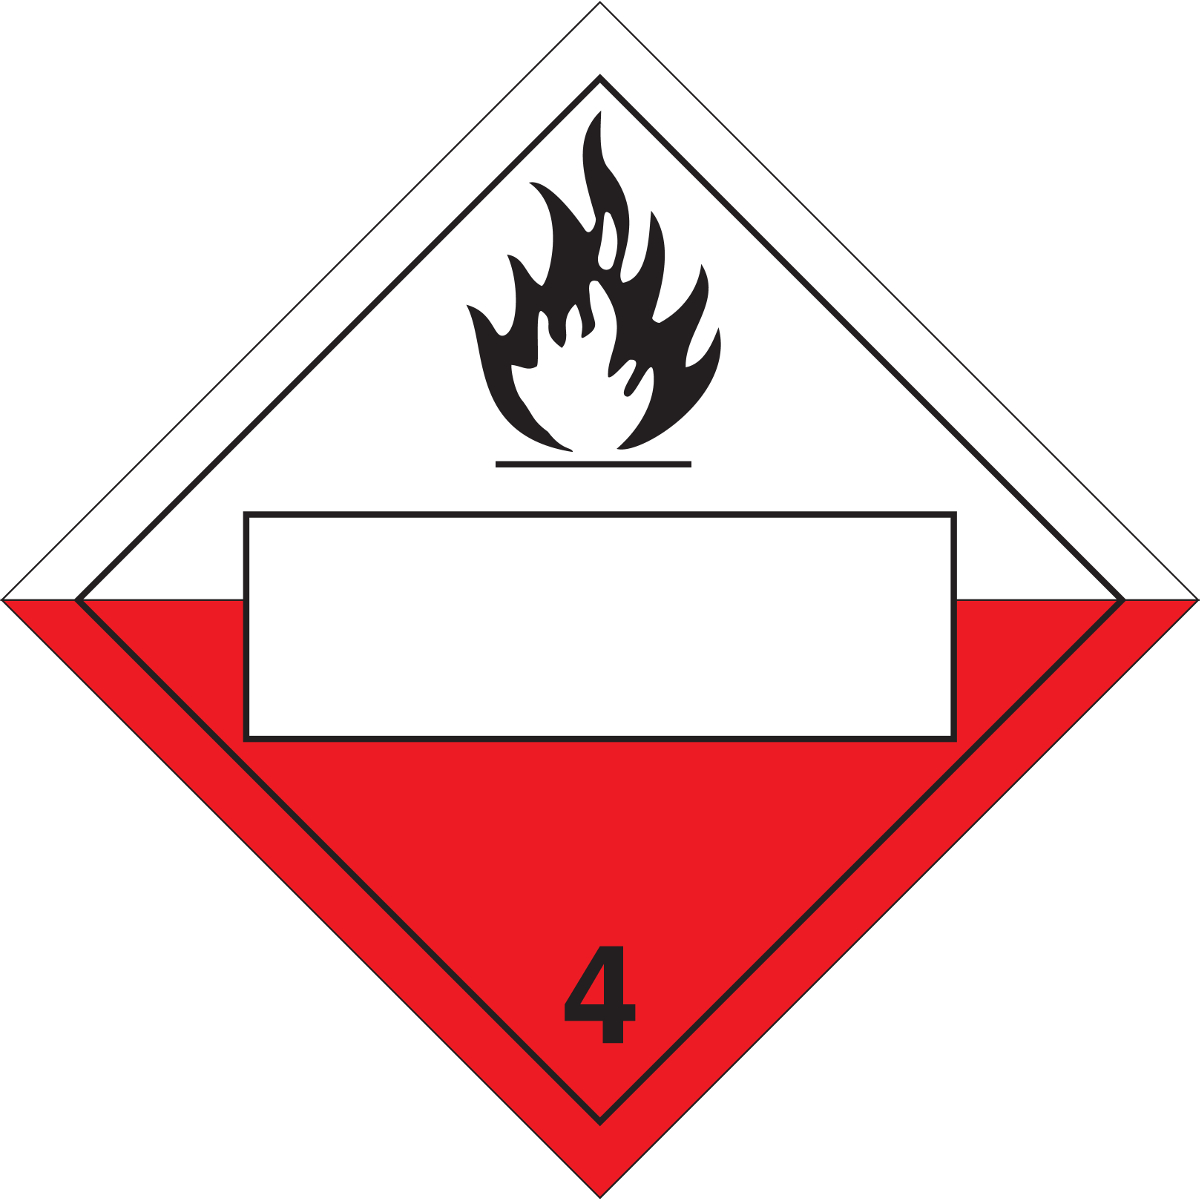 Brady® 60410 Diamond DOT Vehicle Placard, 10-3/4 in W, B-120 Fiberglass, White Background, Red Legend